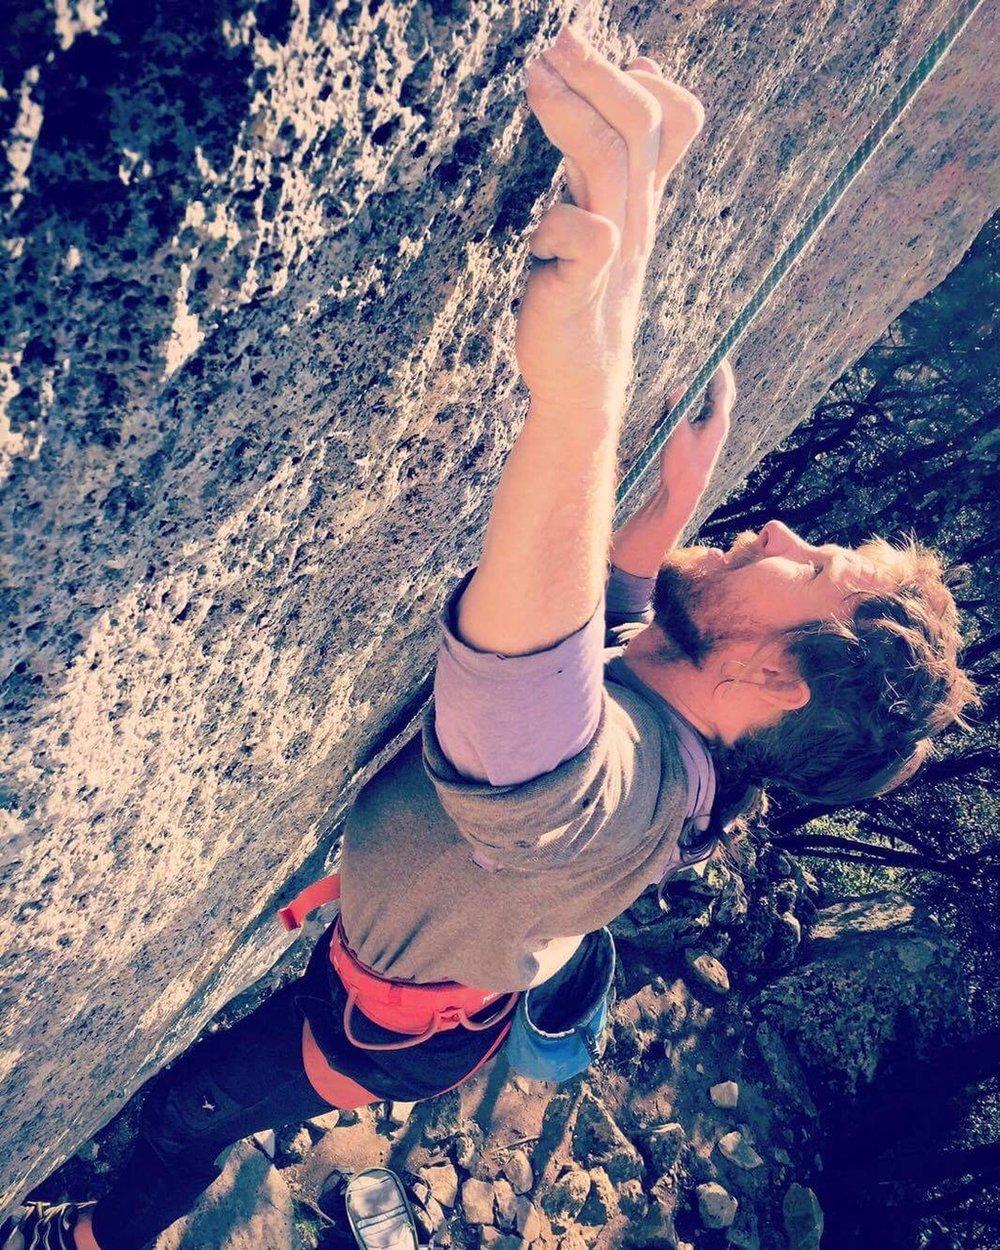 Allen climbing in France 2016.JPG